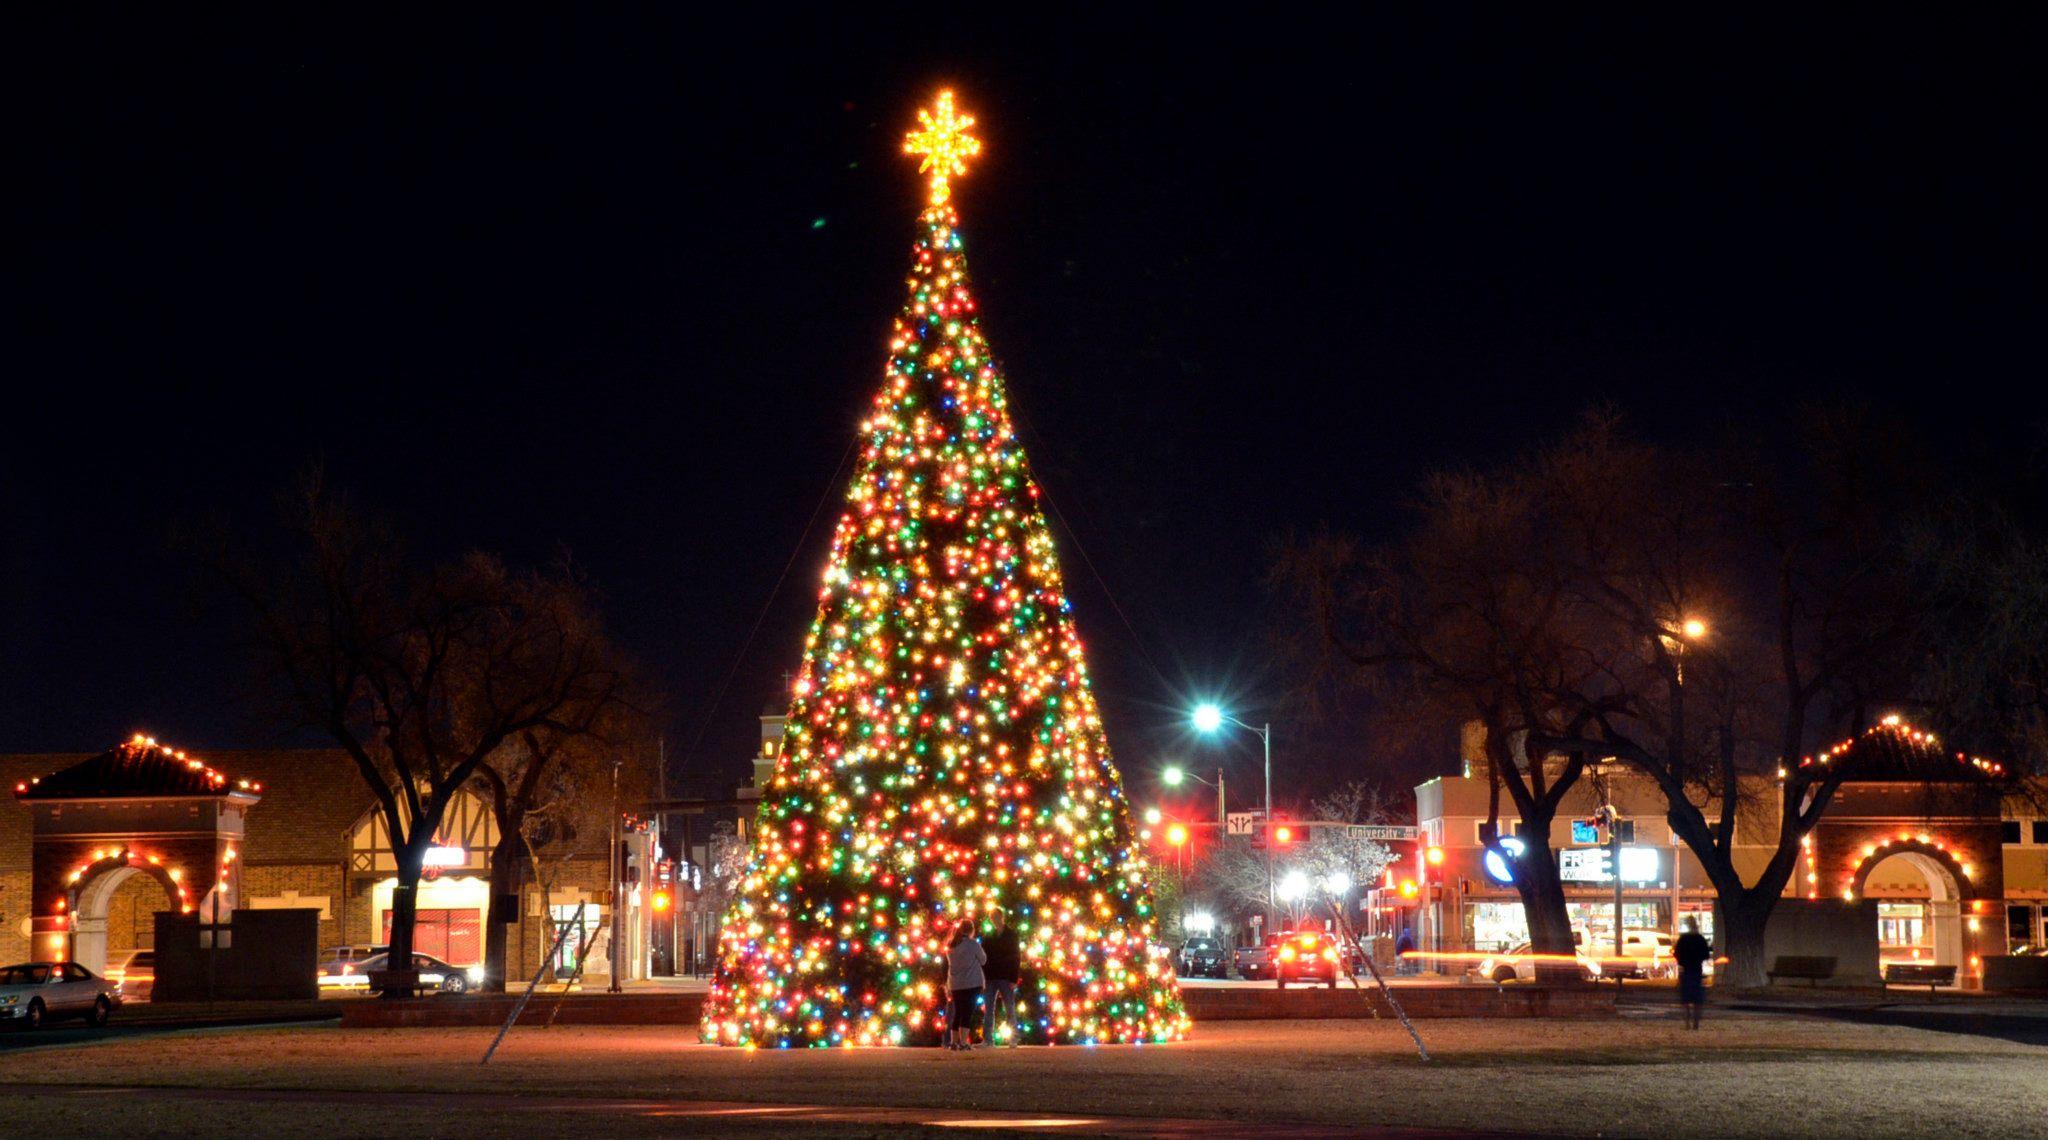 Carol of Lights at Texas Tech University